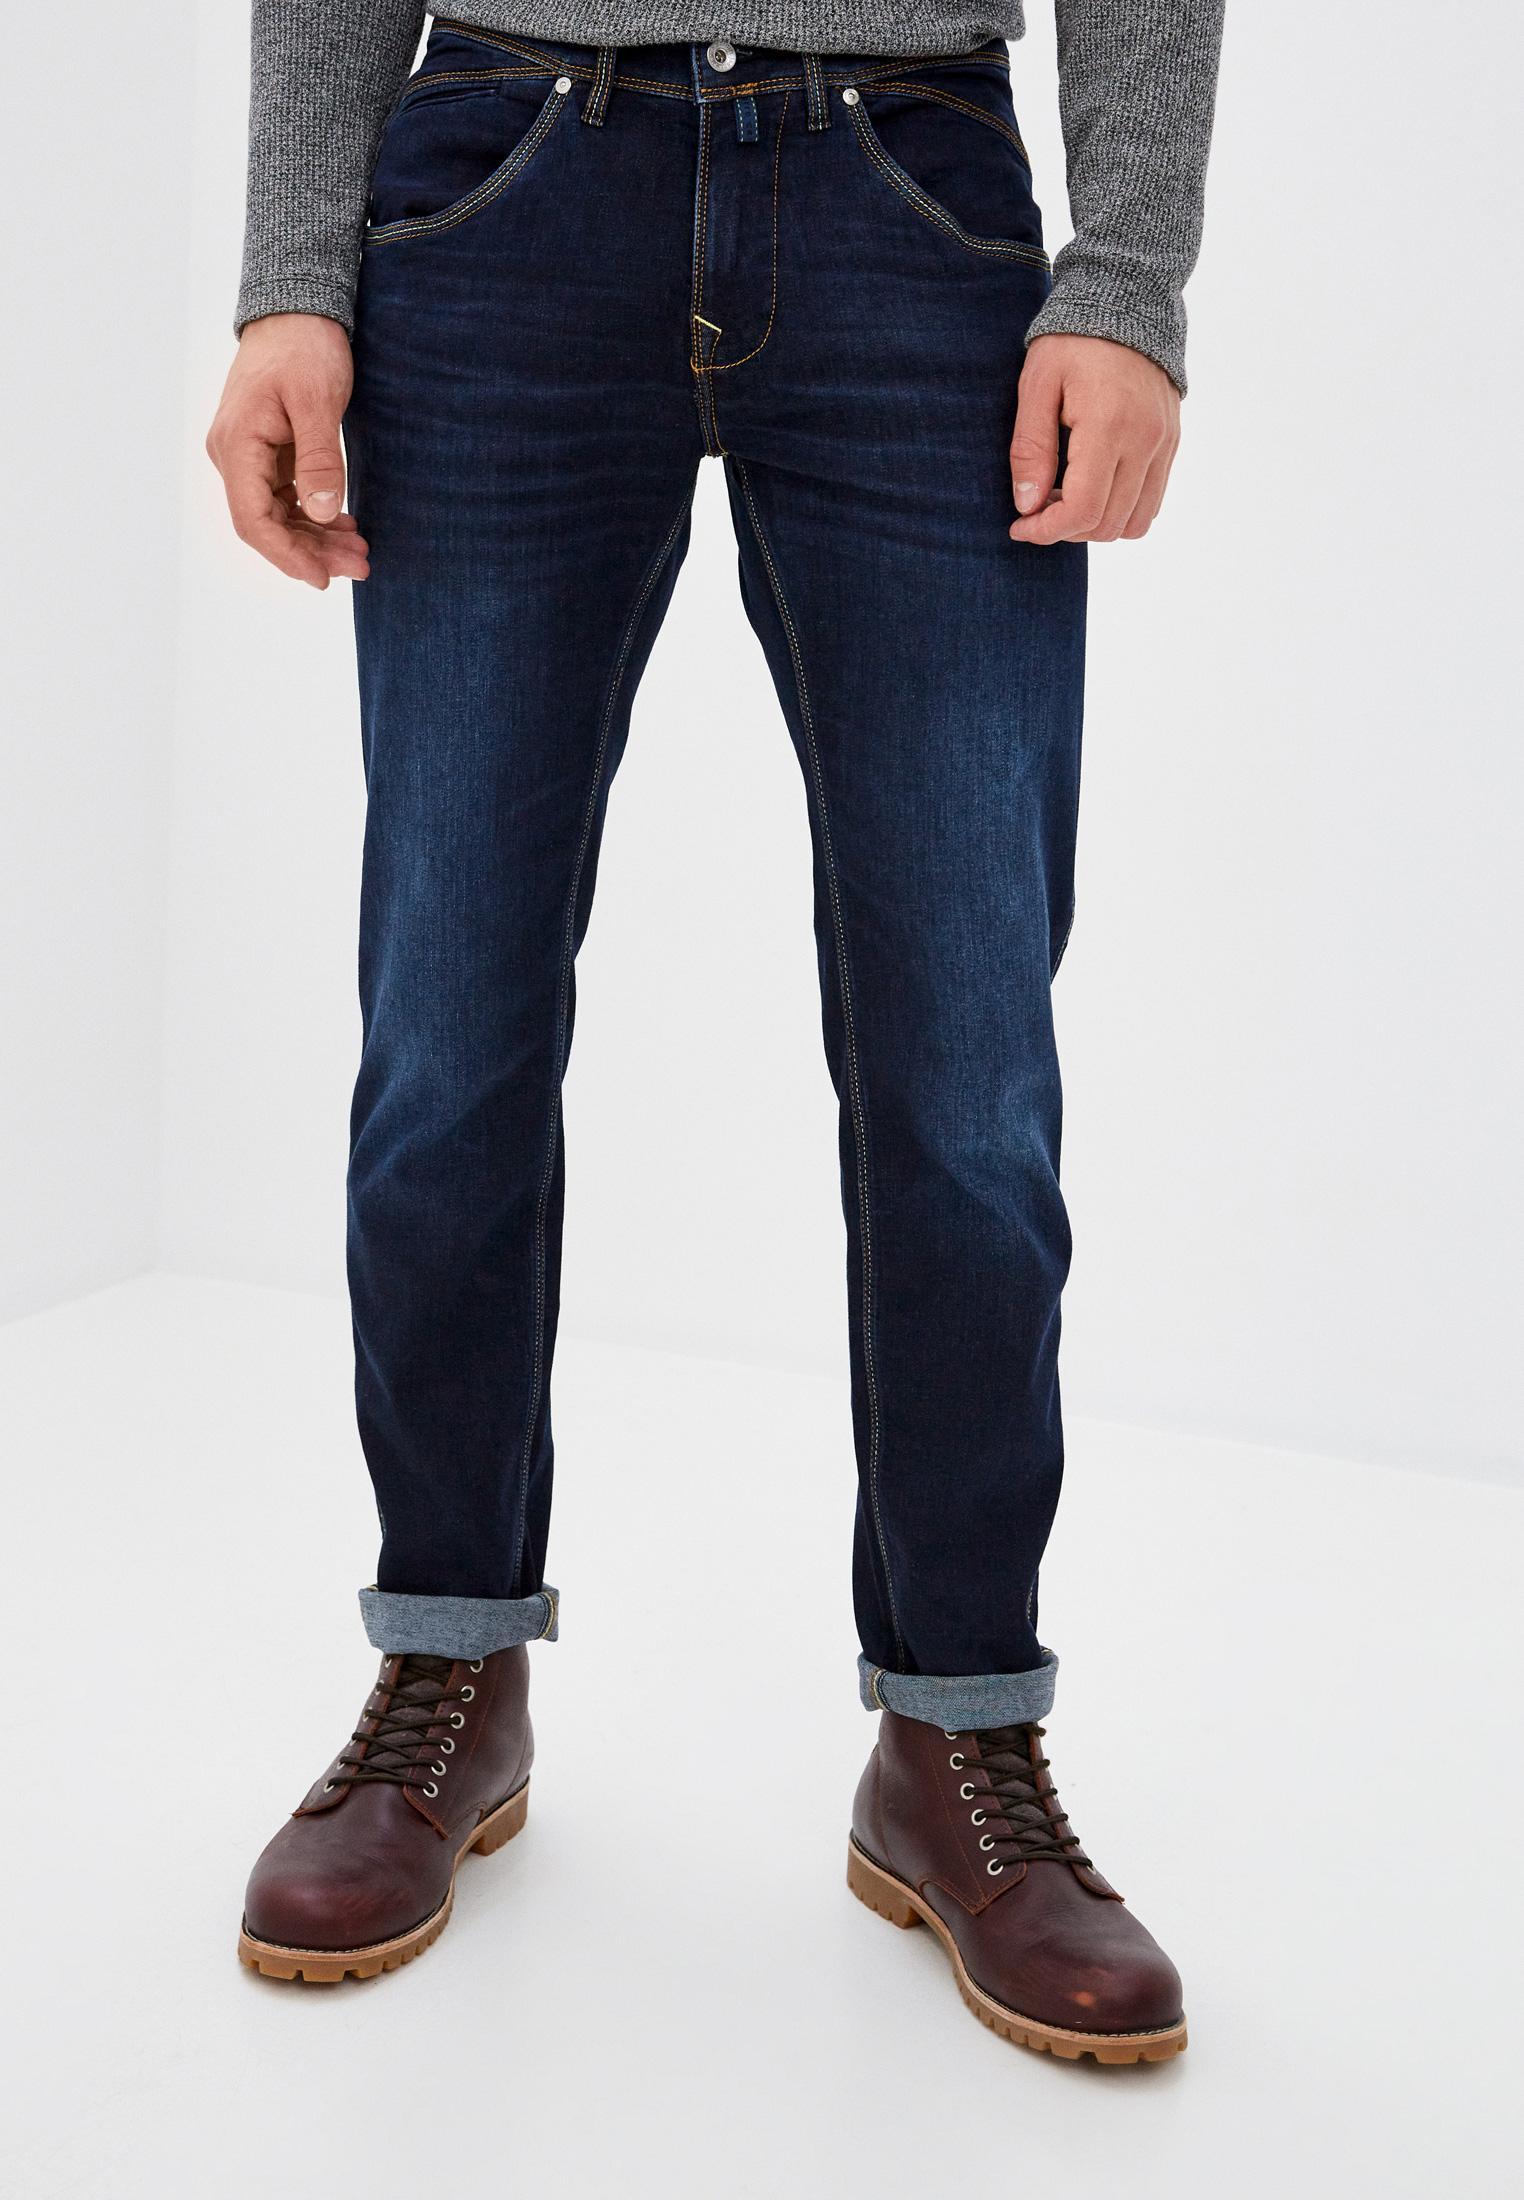 Зауженные джинсы Pierre Cardin (Пьер Кардин) 3009.6101.02